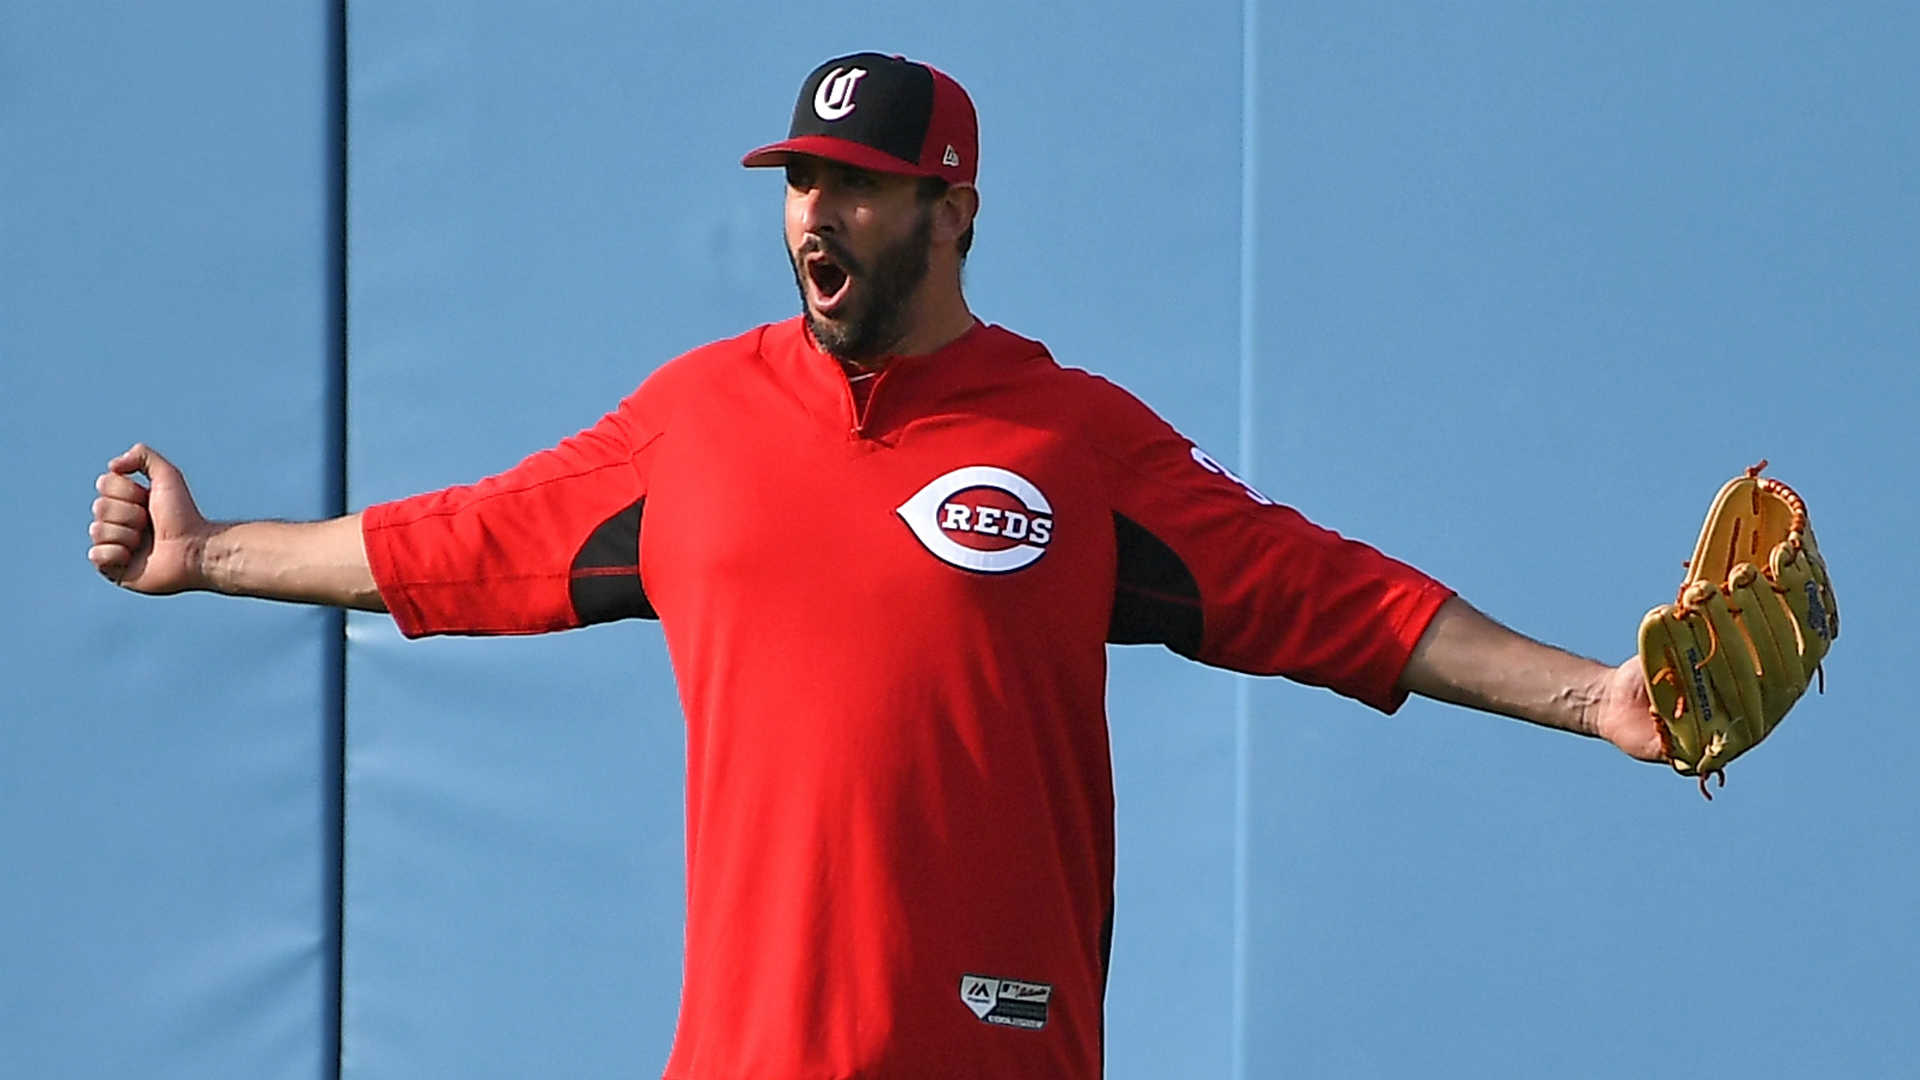 MLB trade rumors: Reds may already be looking to deal Matt Harvey